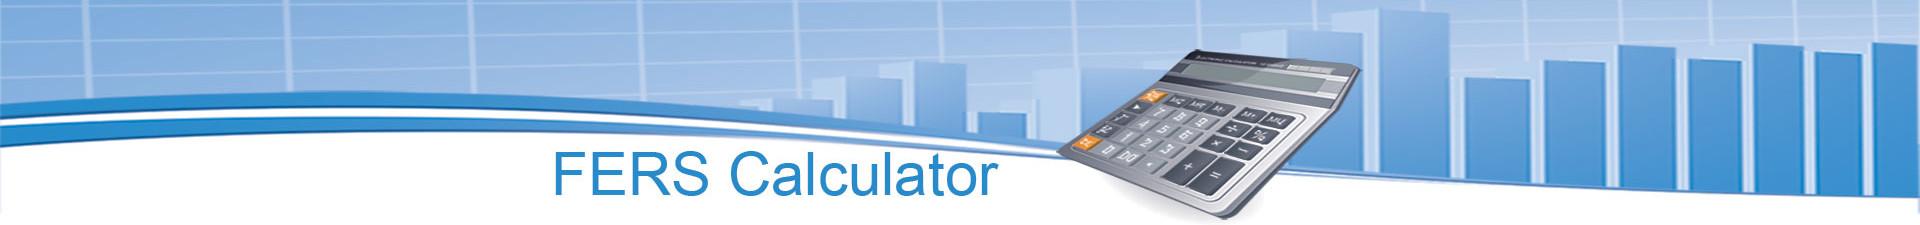 FERS Calculator - Retirement Benefits InstituteRetirement Benefits